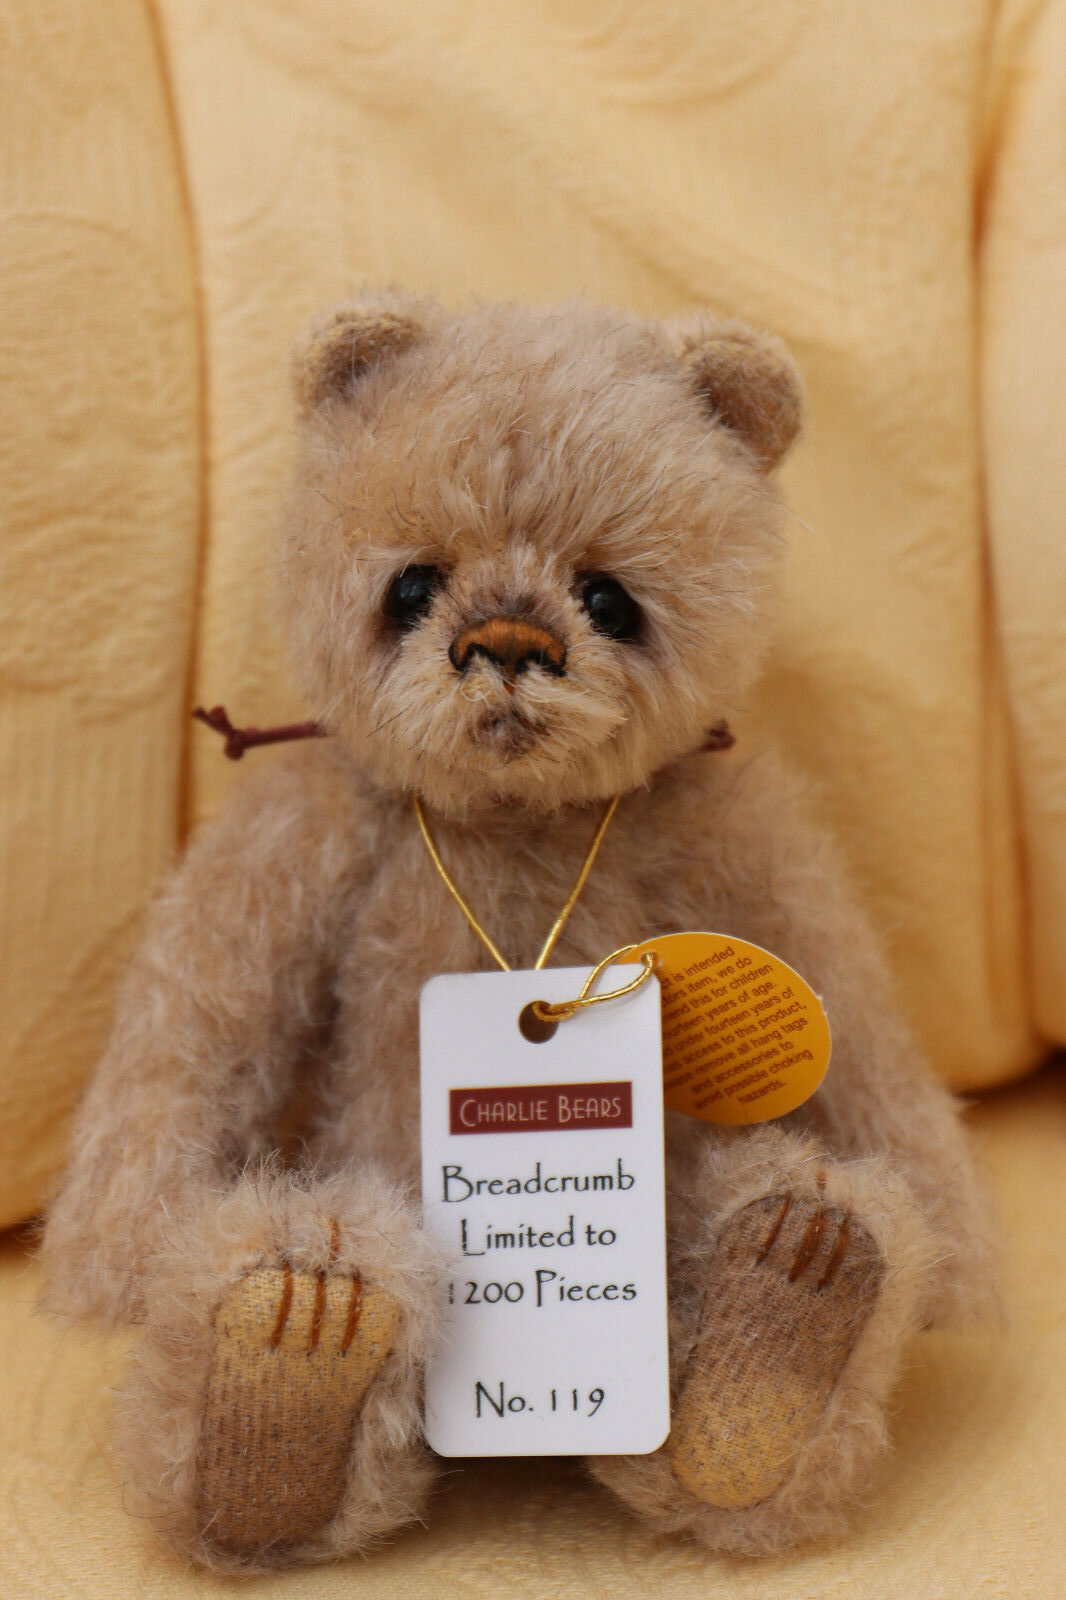 Charlie Bears Bears Bears - Breadcrumb - Minimo - MM655510B ac8302